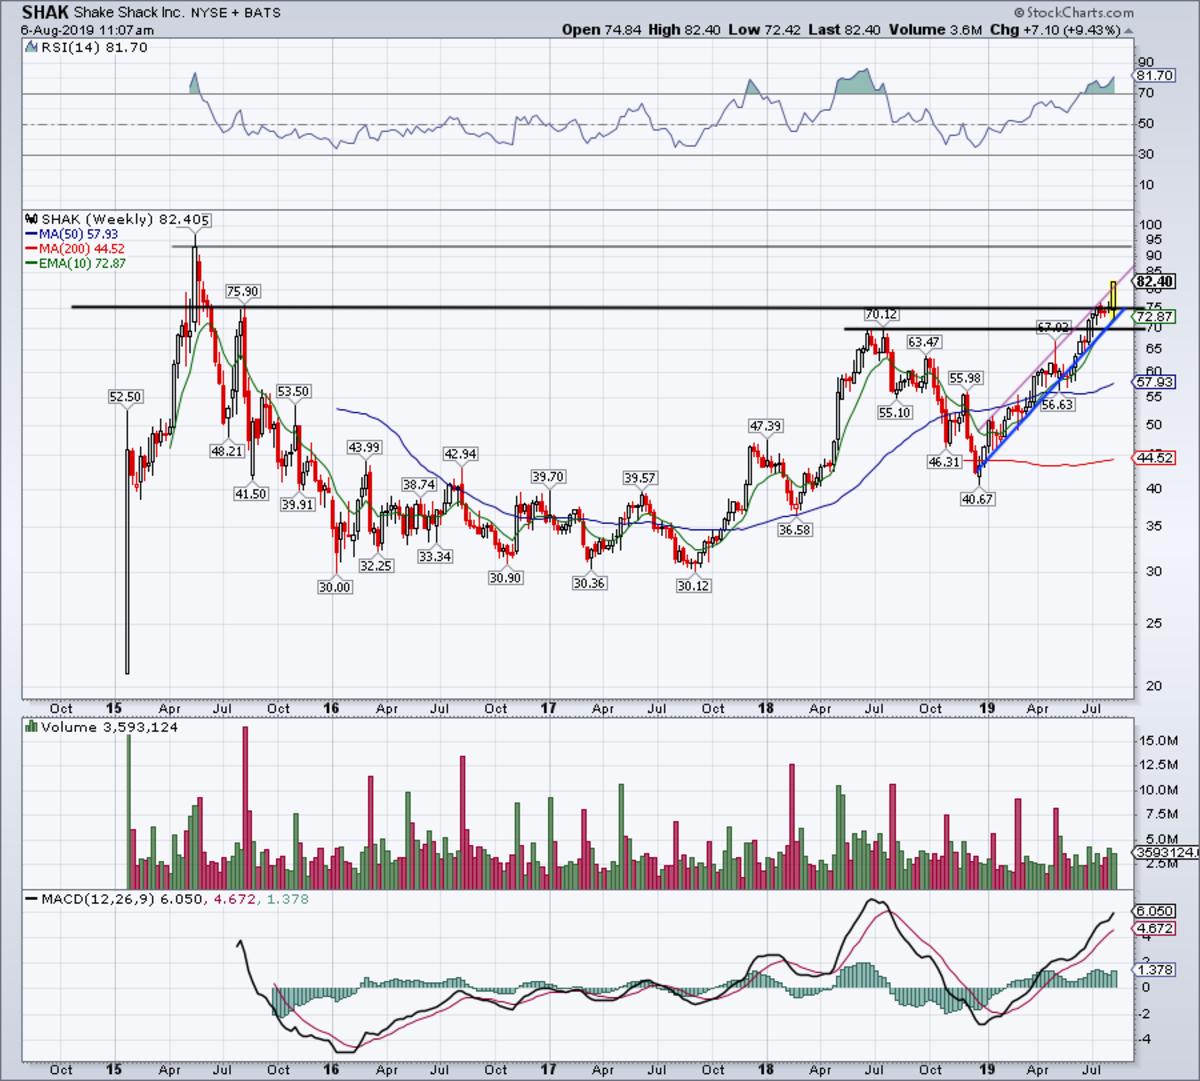 Weekly chart of Shake Shack stock.